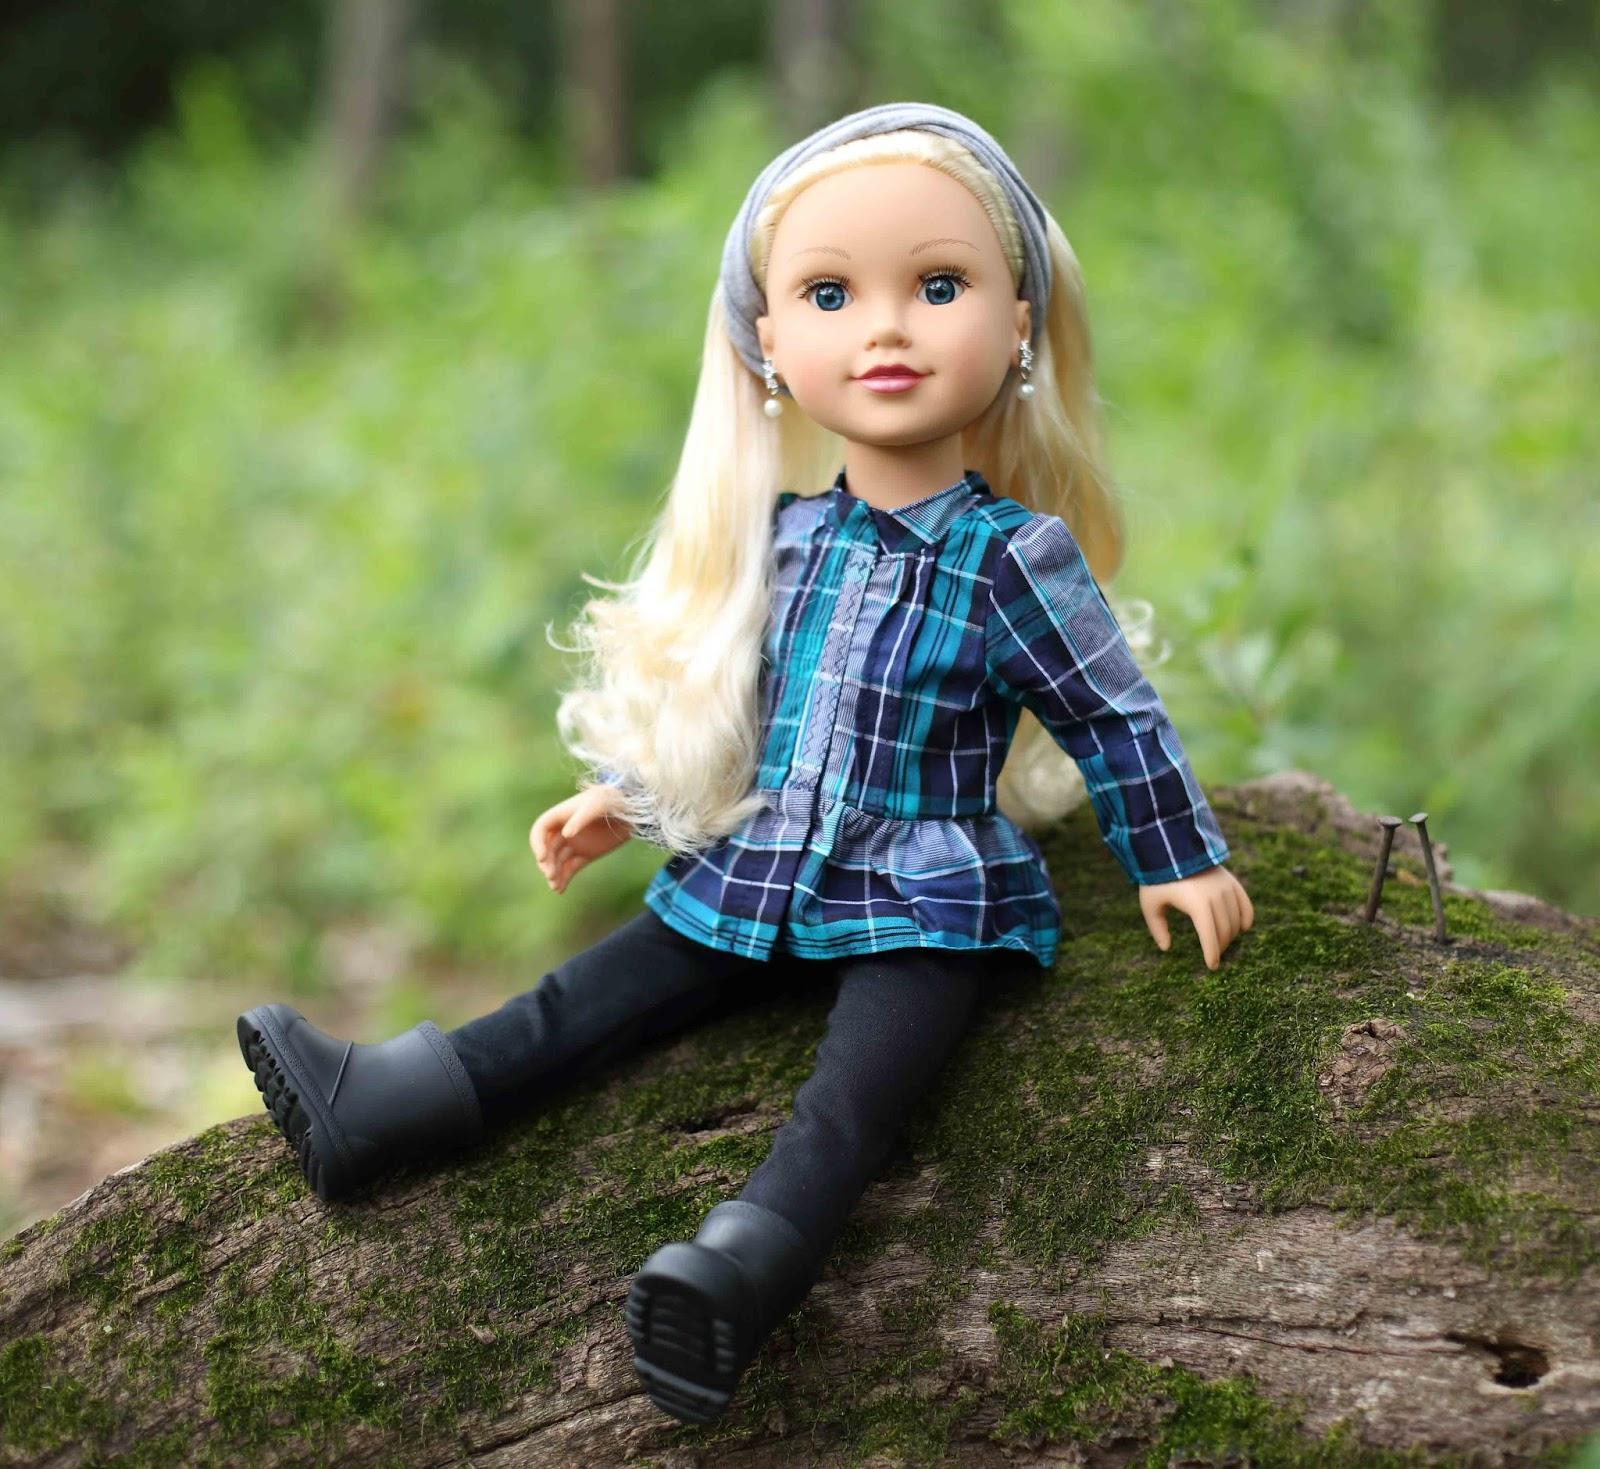 My Journey Girls Dolls Adventures: Giovanna In a New York